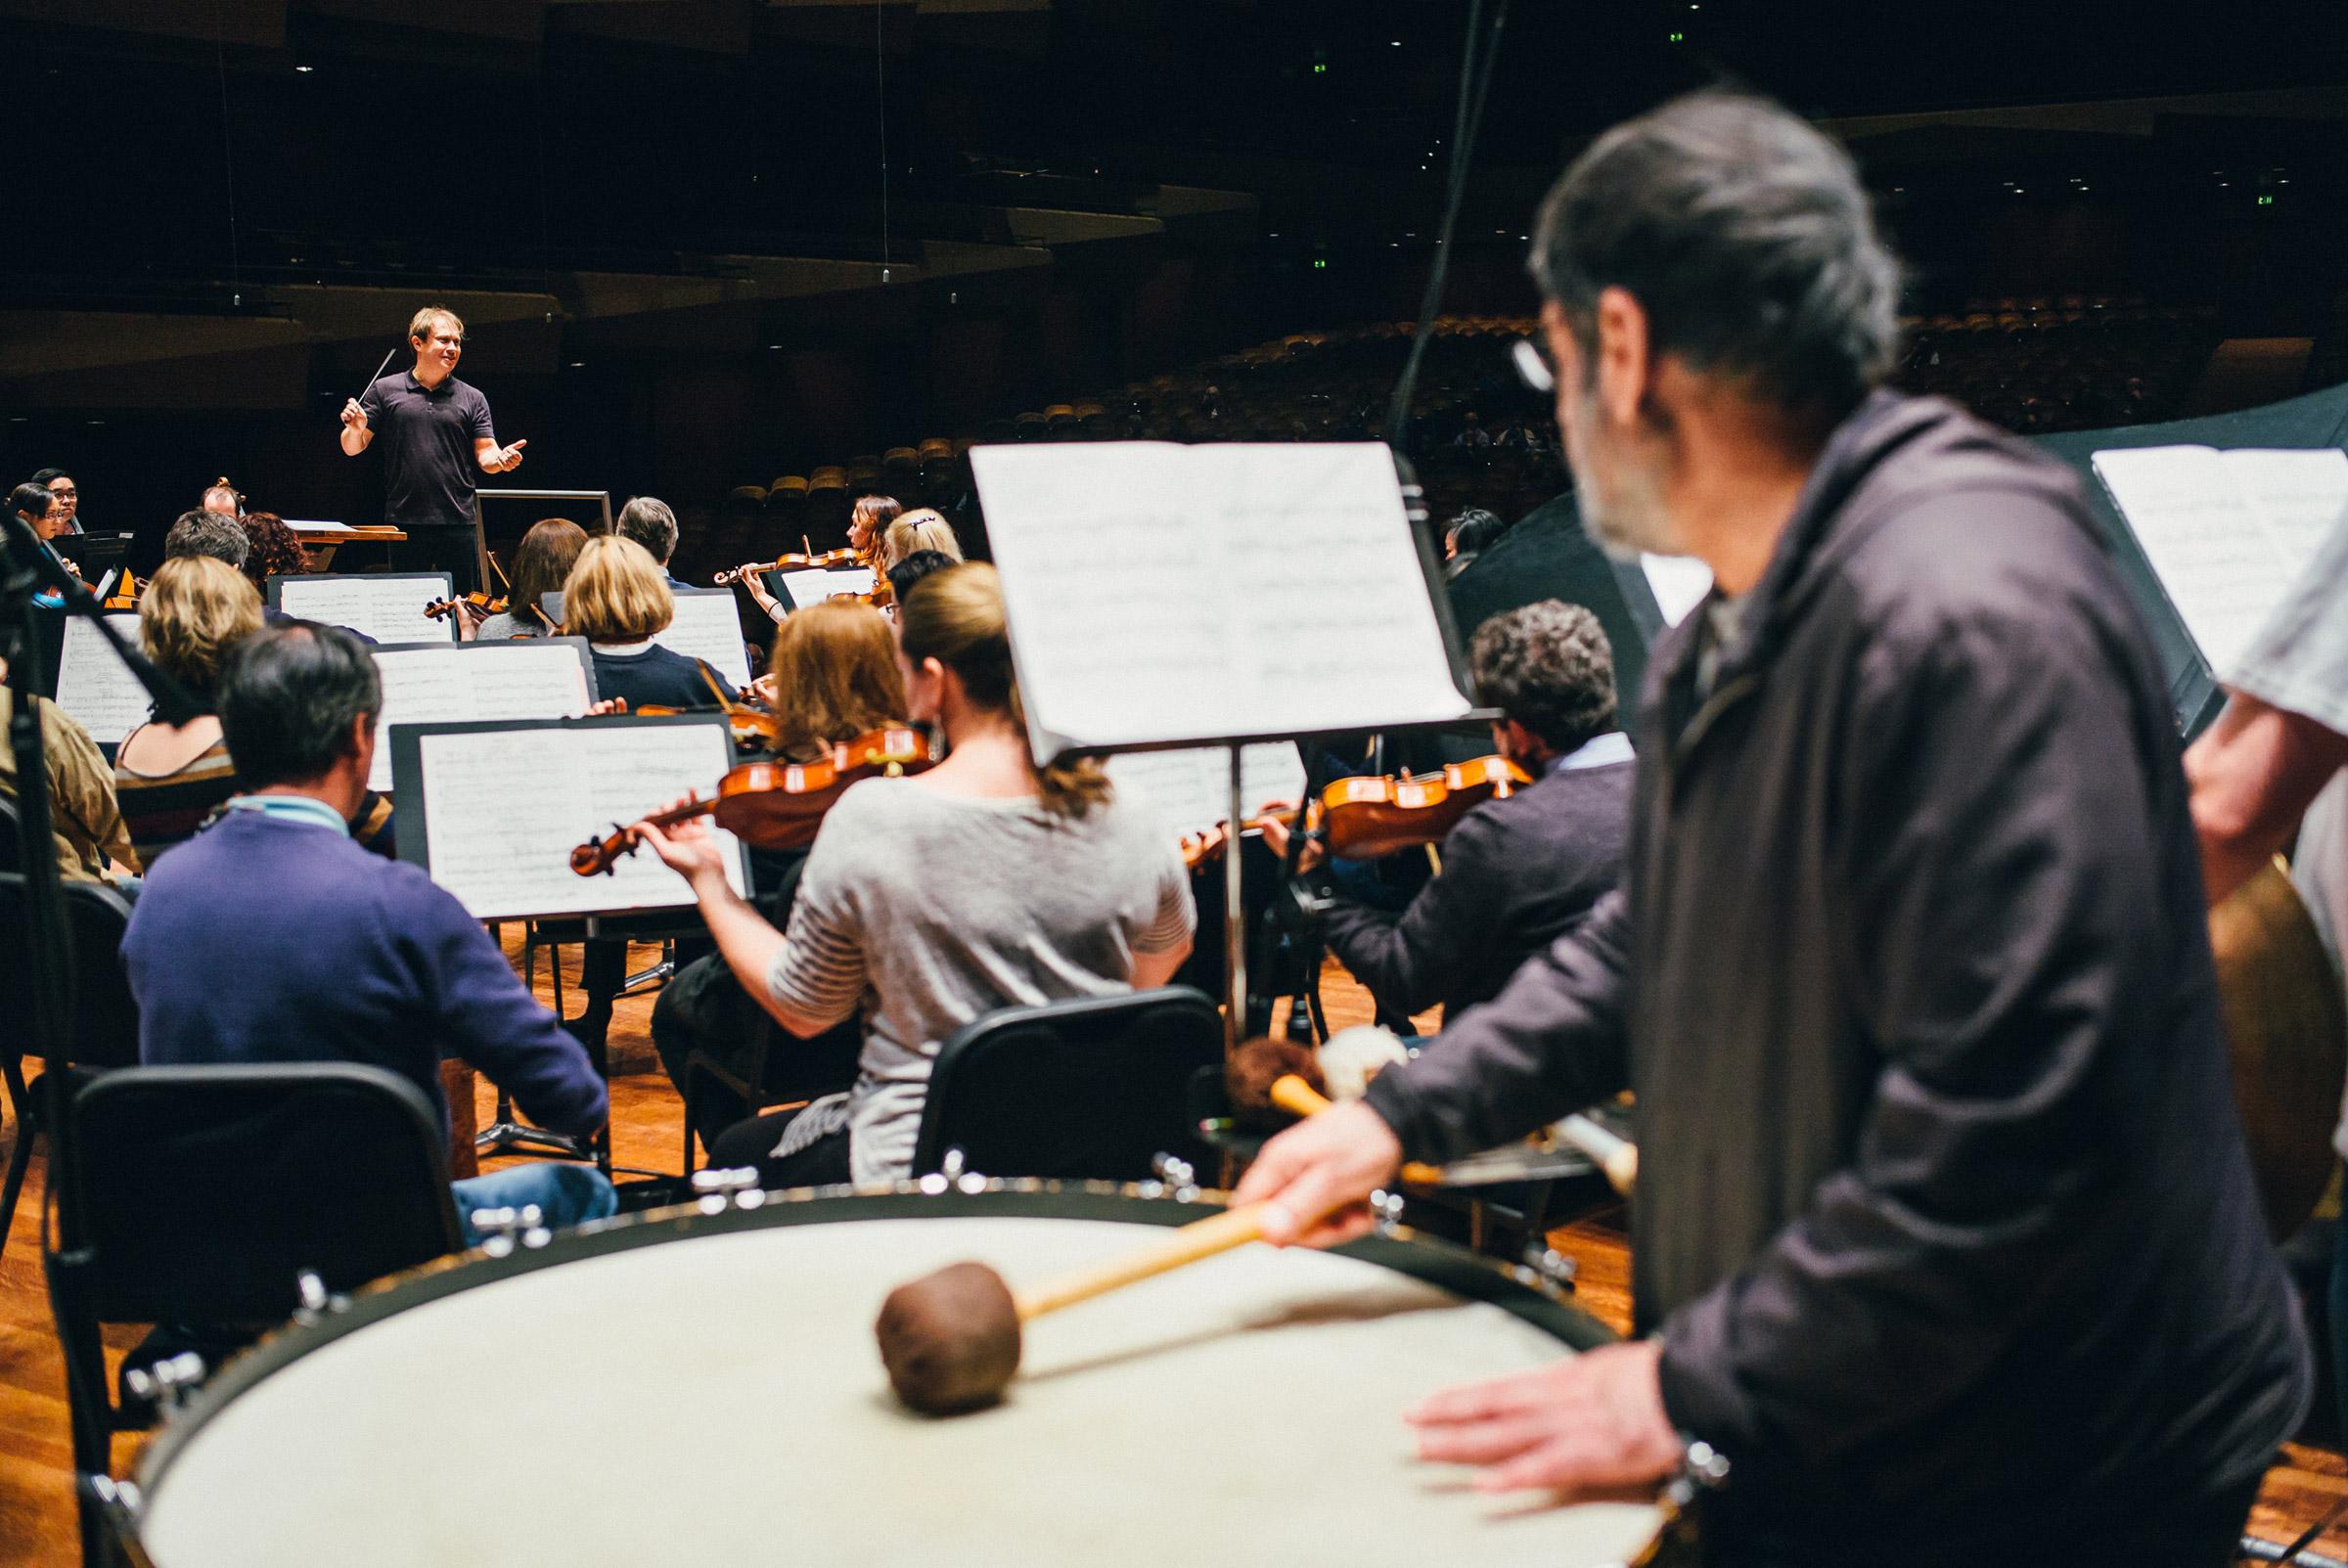 seattle-symphony-orchestra-brandon-patoc-rehearsal-ludovic-morlot-02.JPG